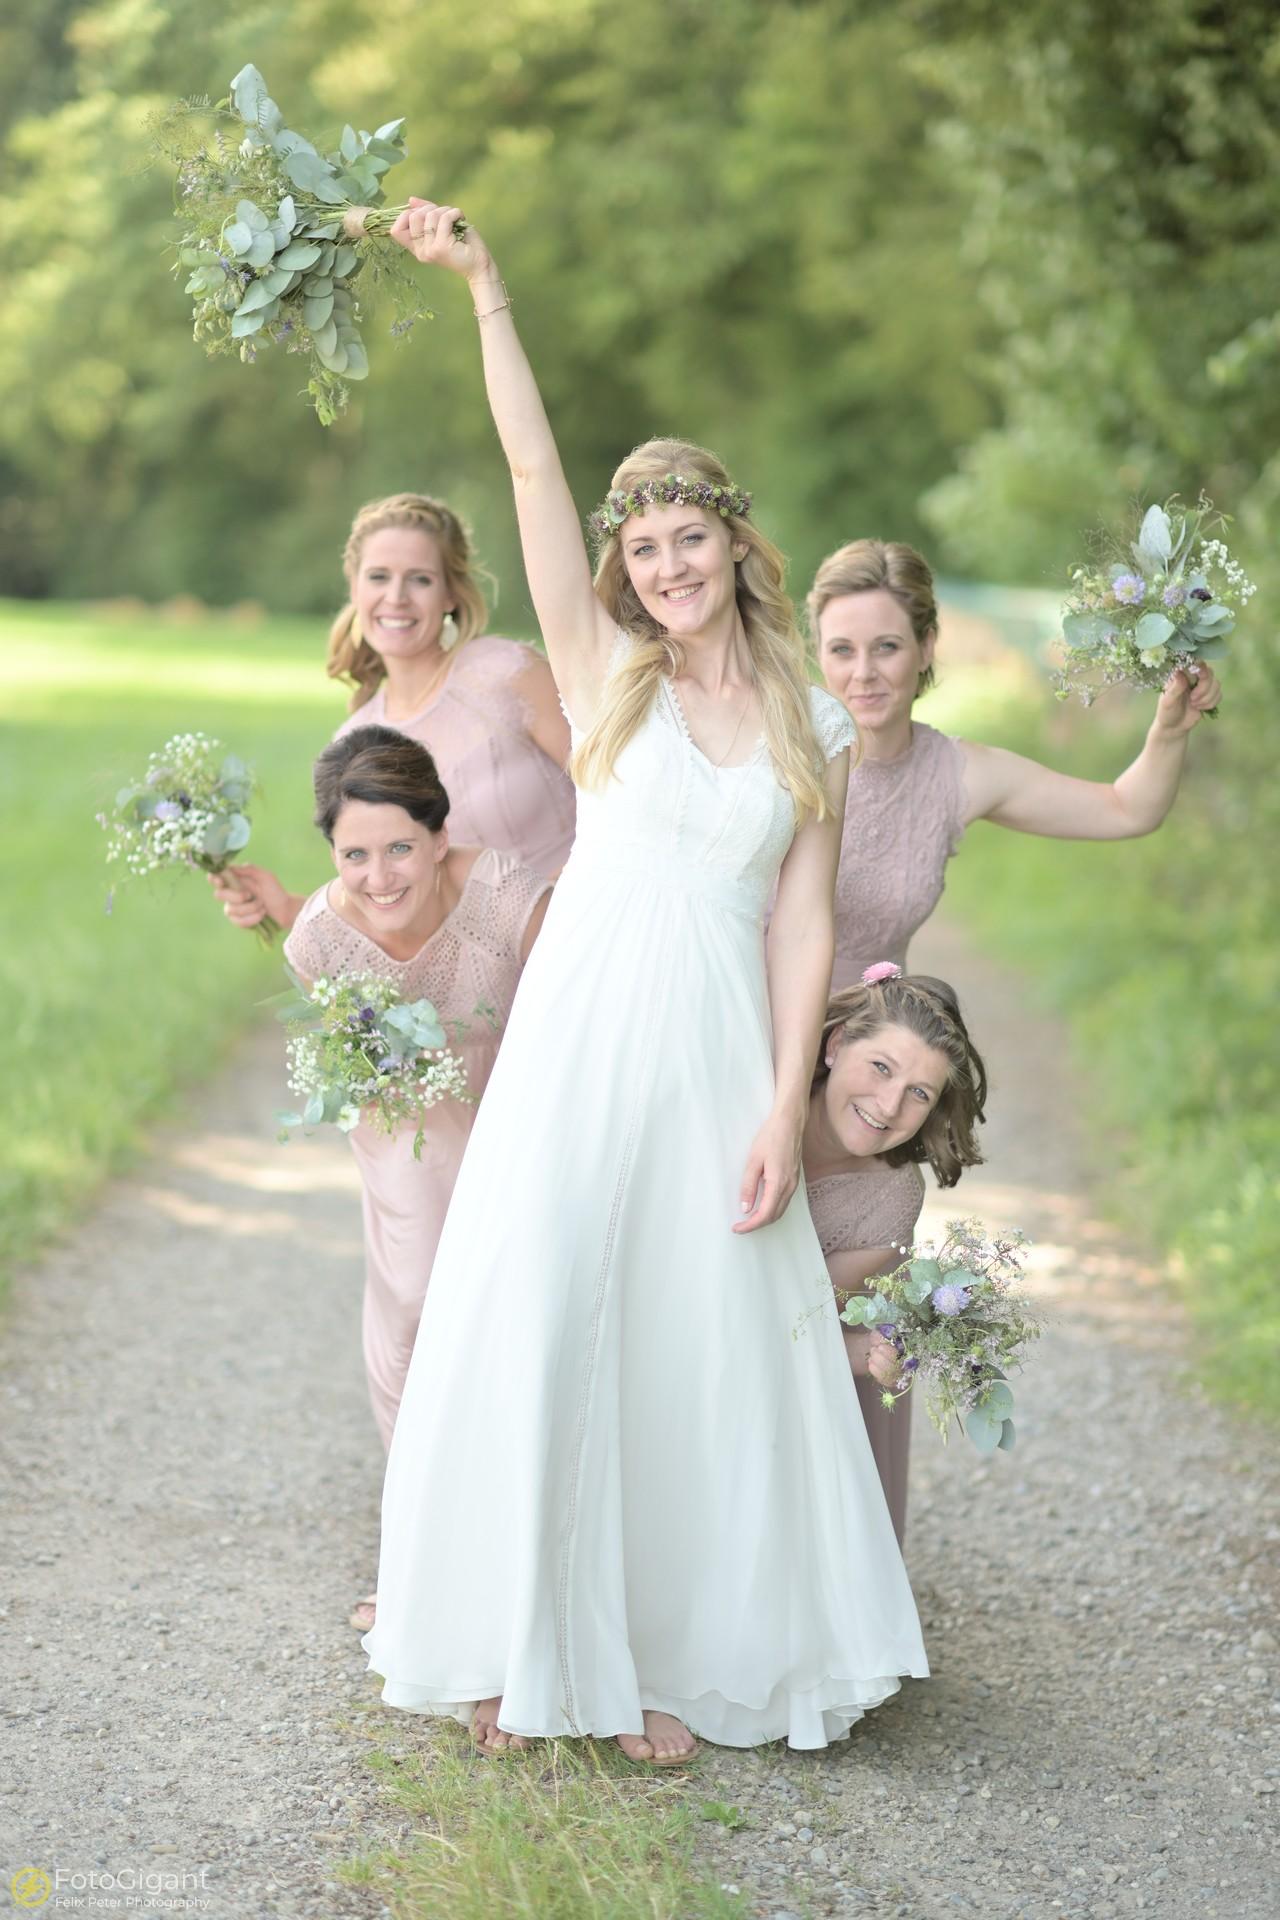 Hochzeitsfotograf_Bern_29.jpg